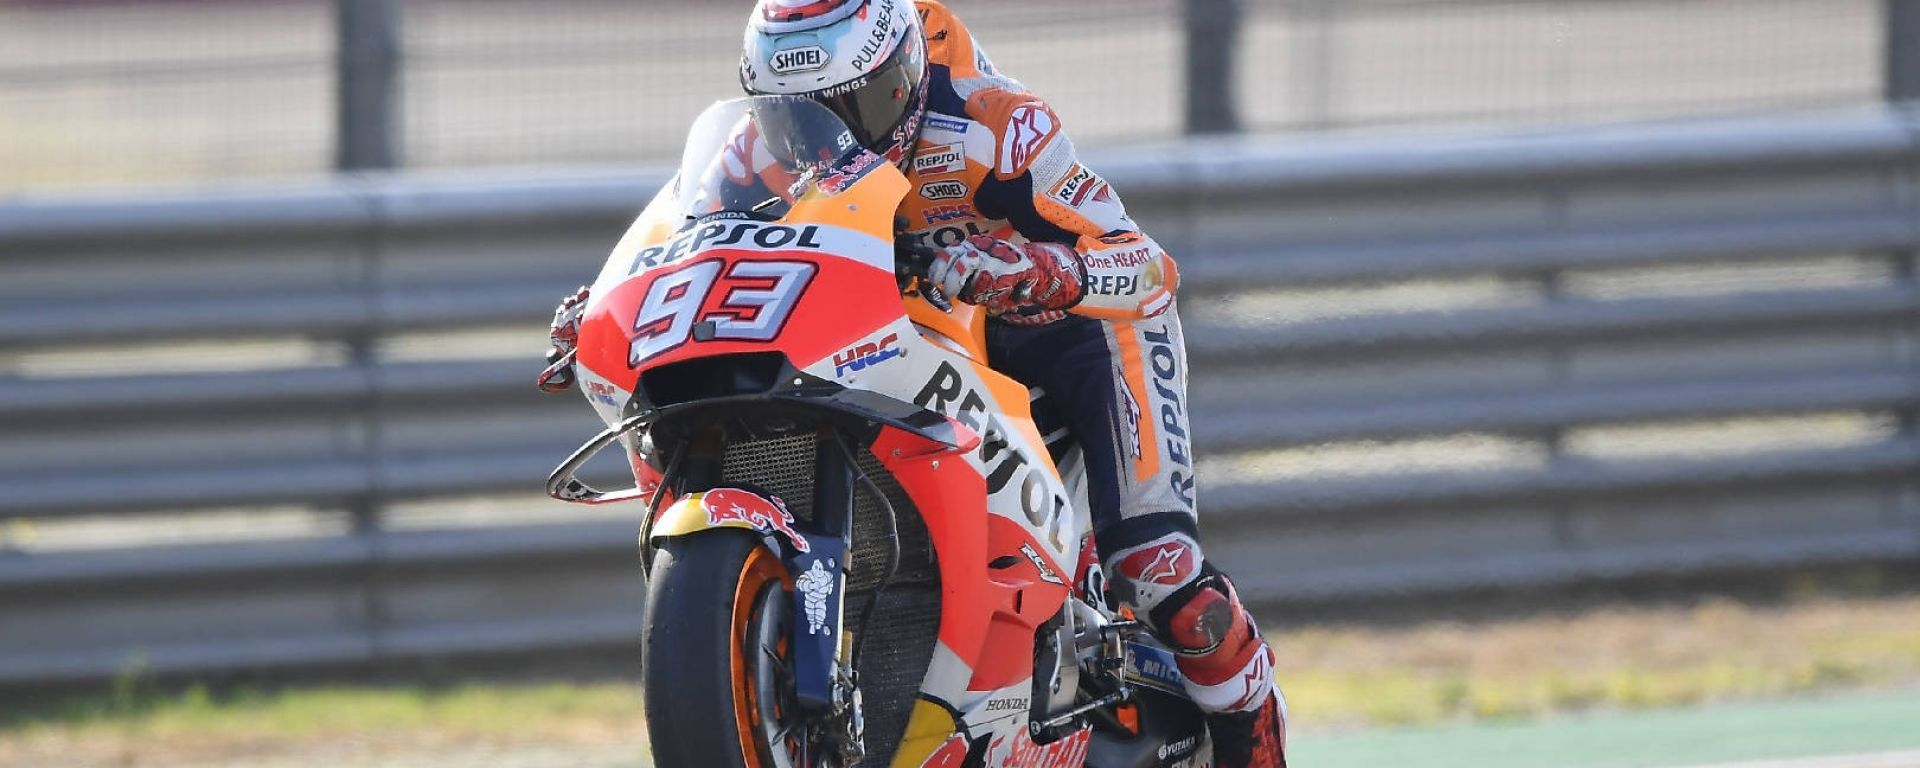 Motogp Aragon 2018: vince Marquez davanti a Dovizioso